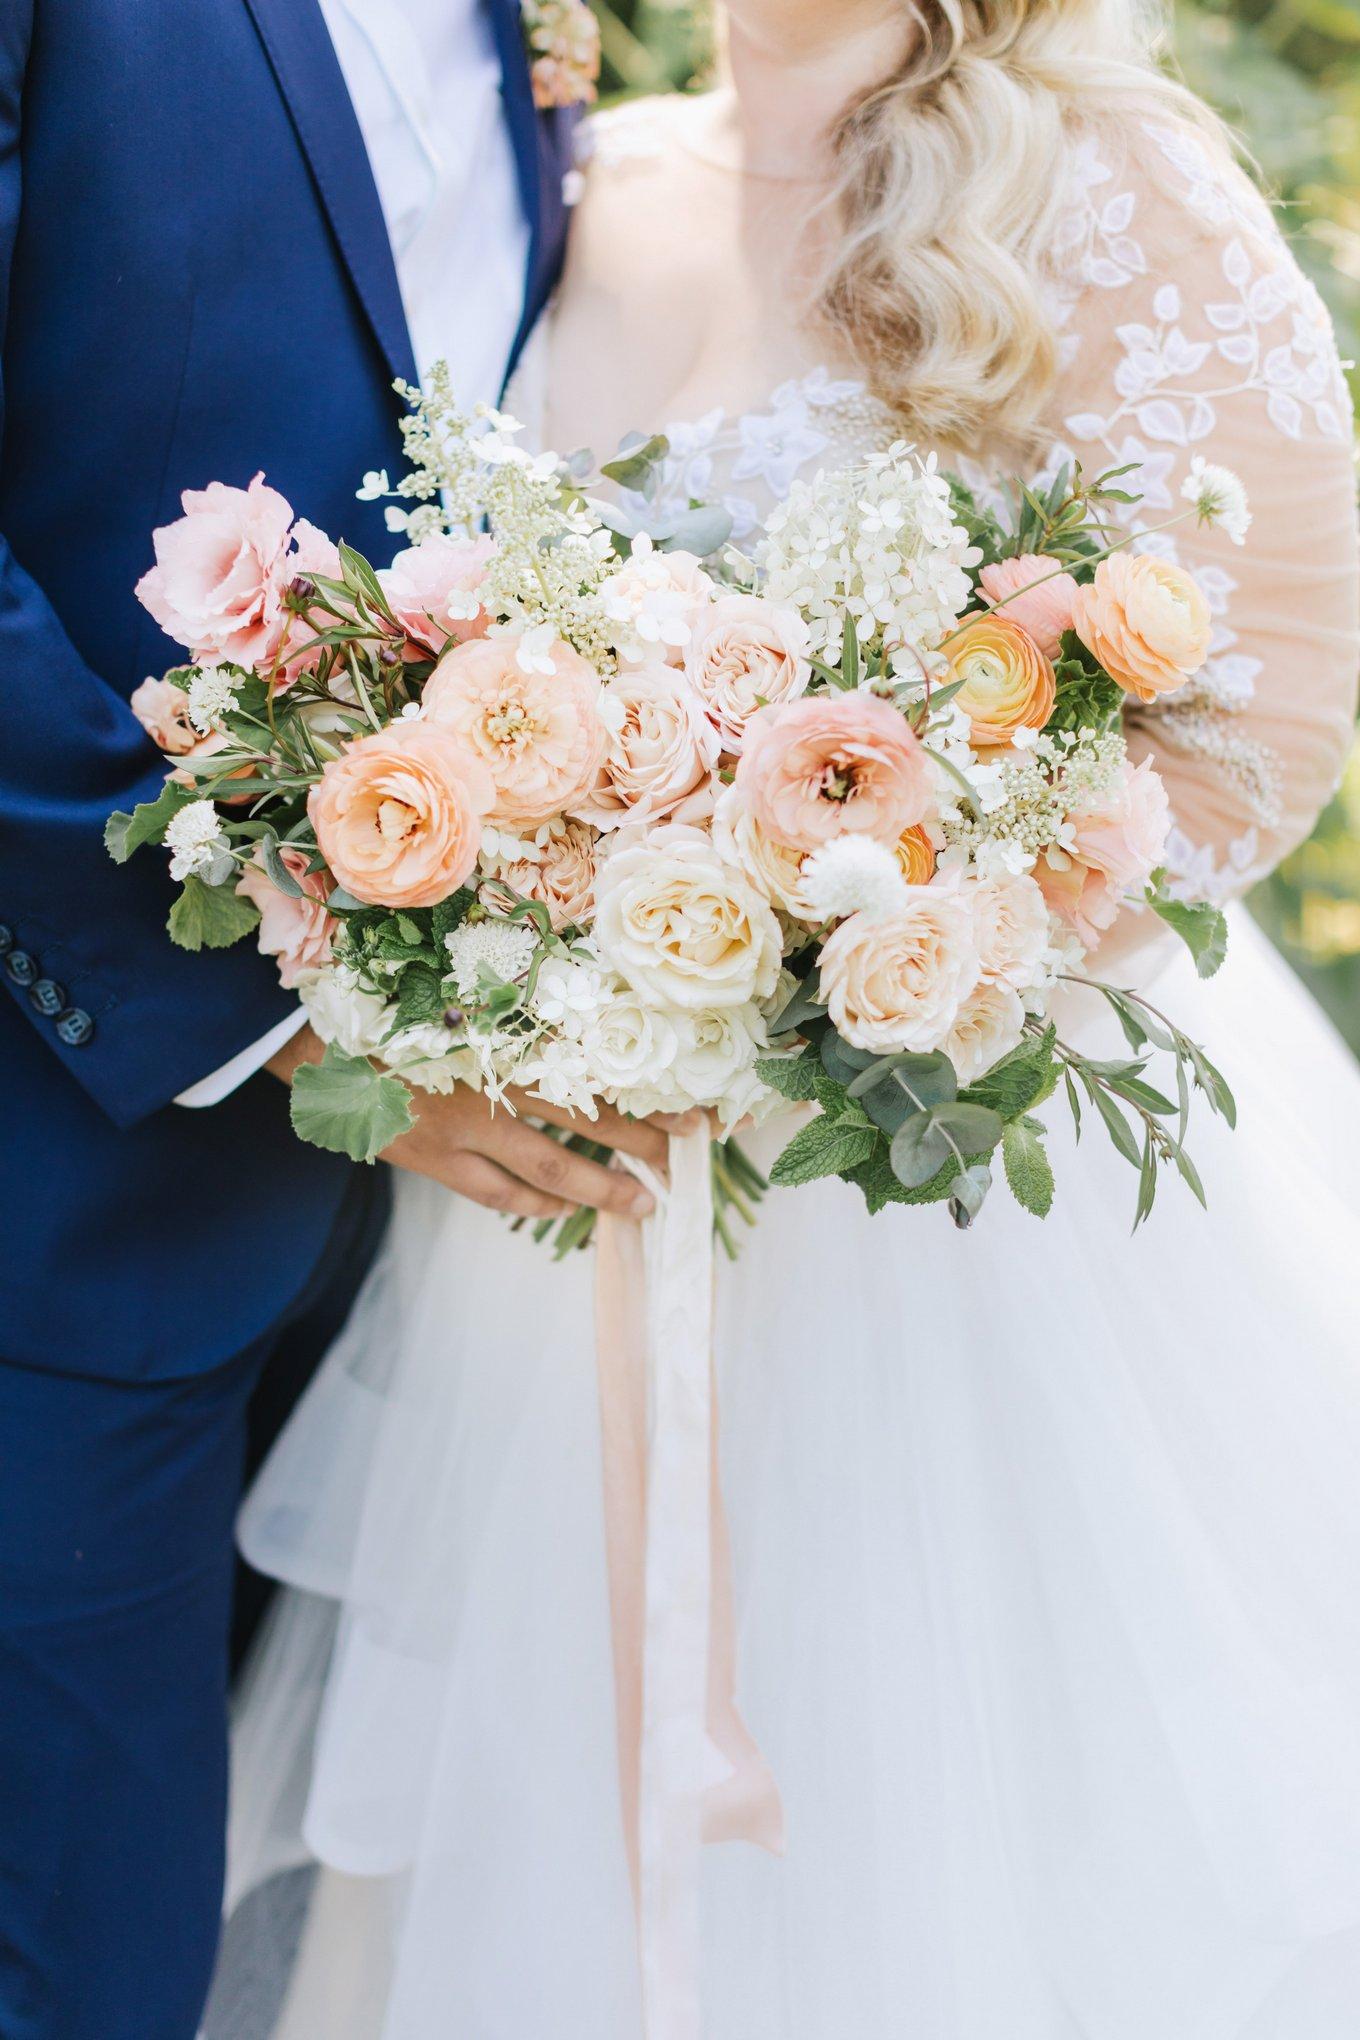 Marthas-Vineyard-Wedding-Photographer-Beach-Plum-Inn-15.jpg